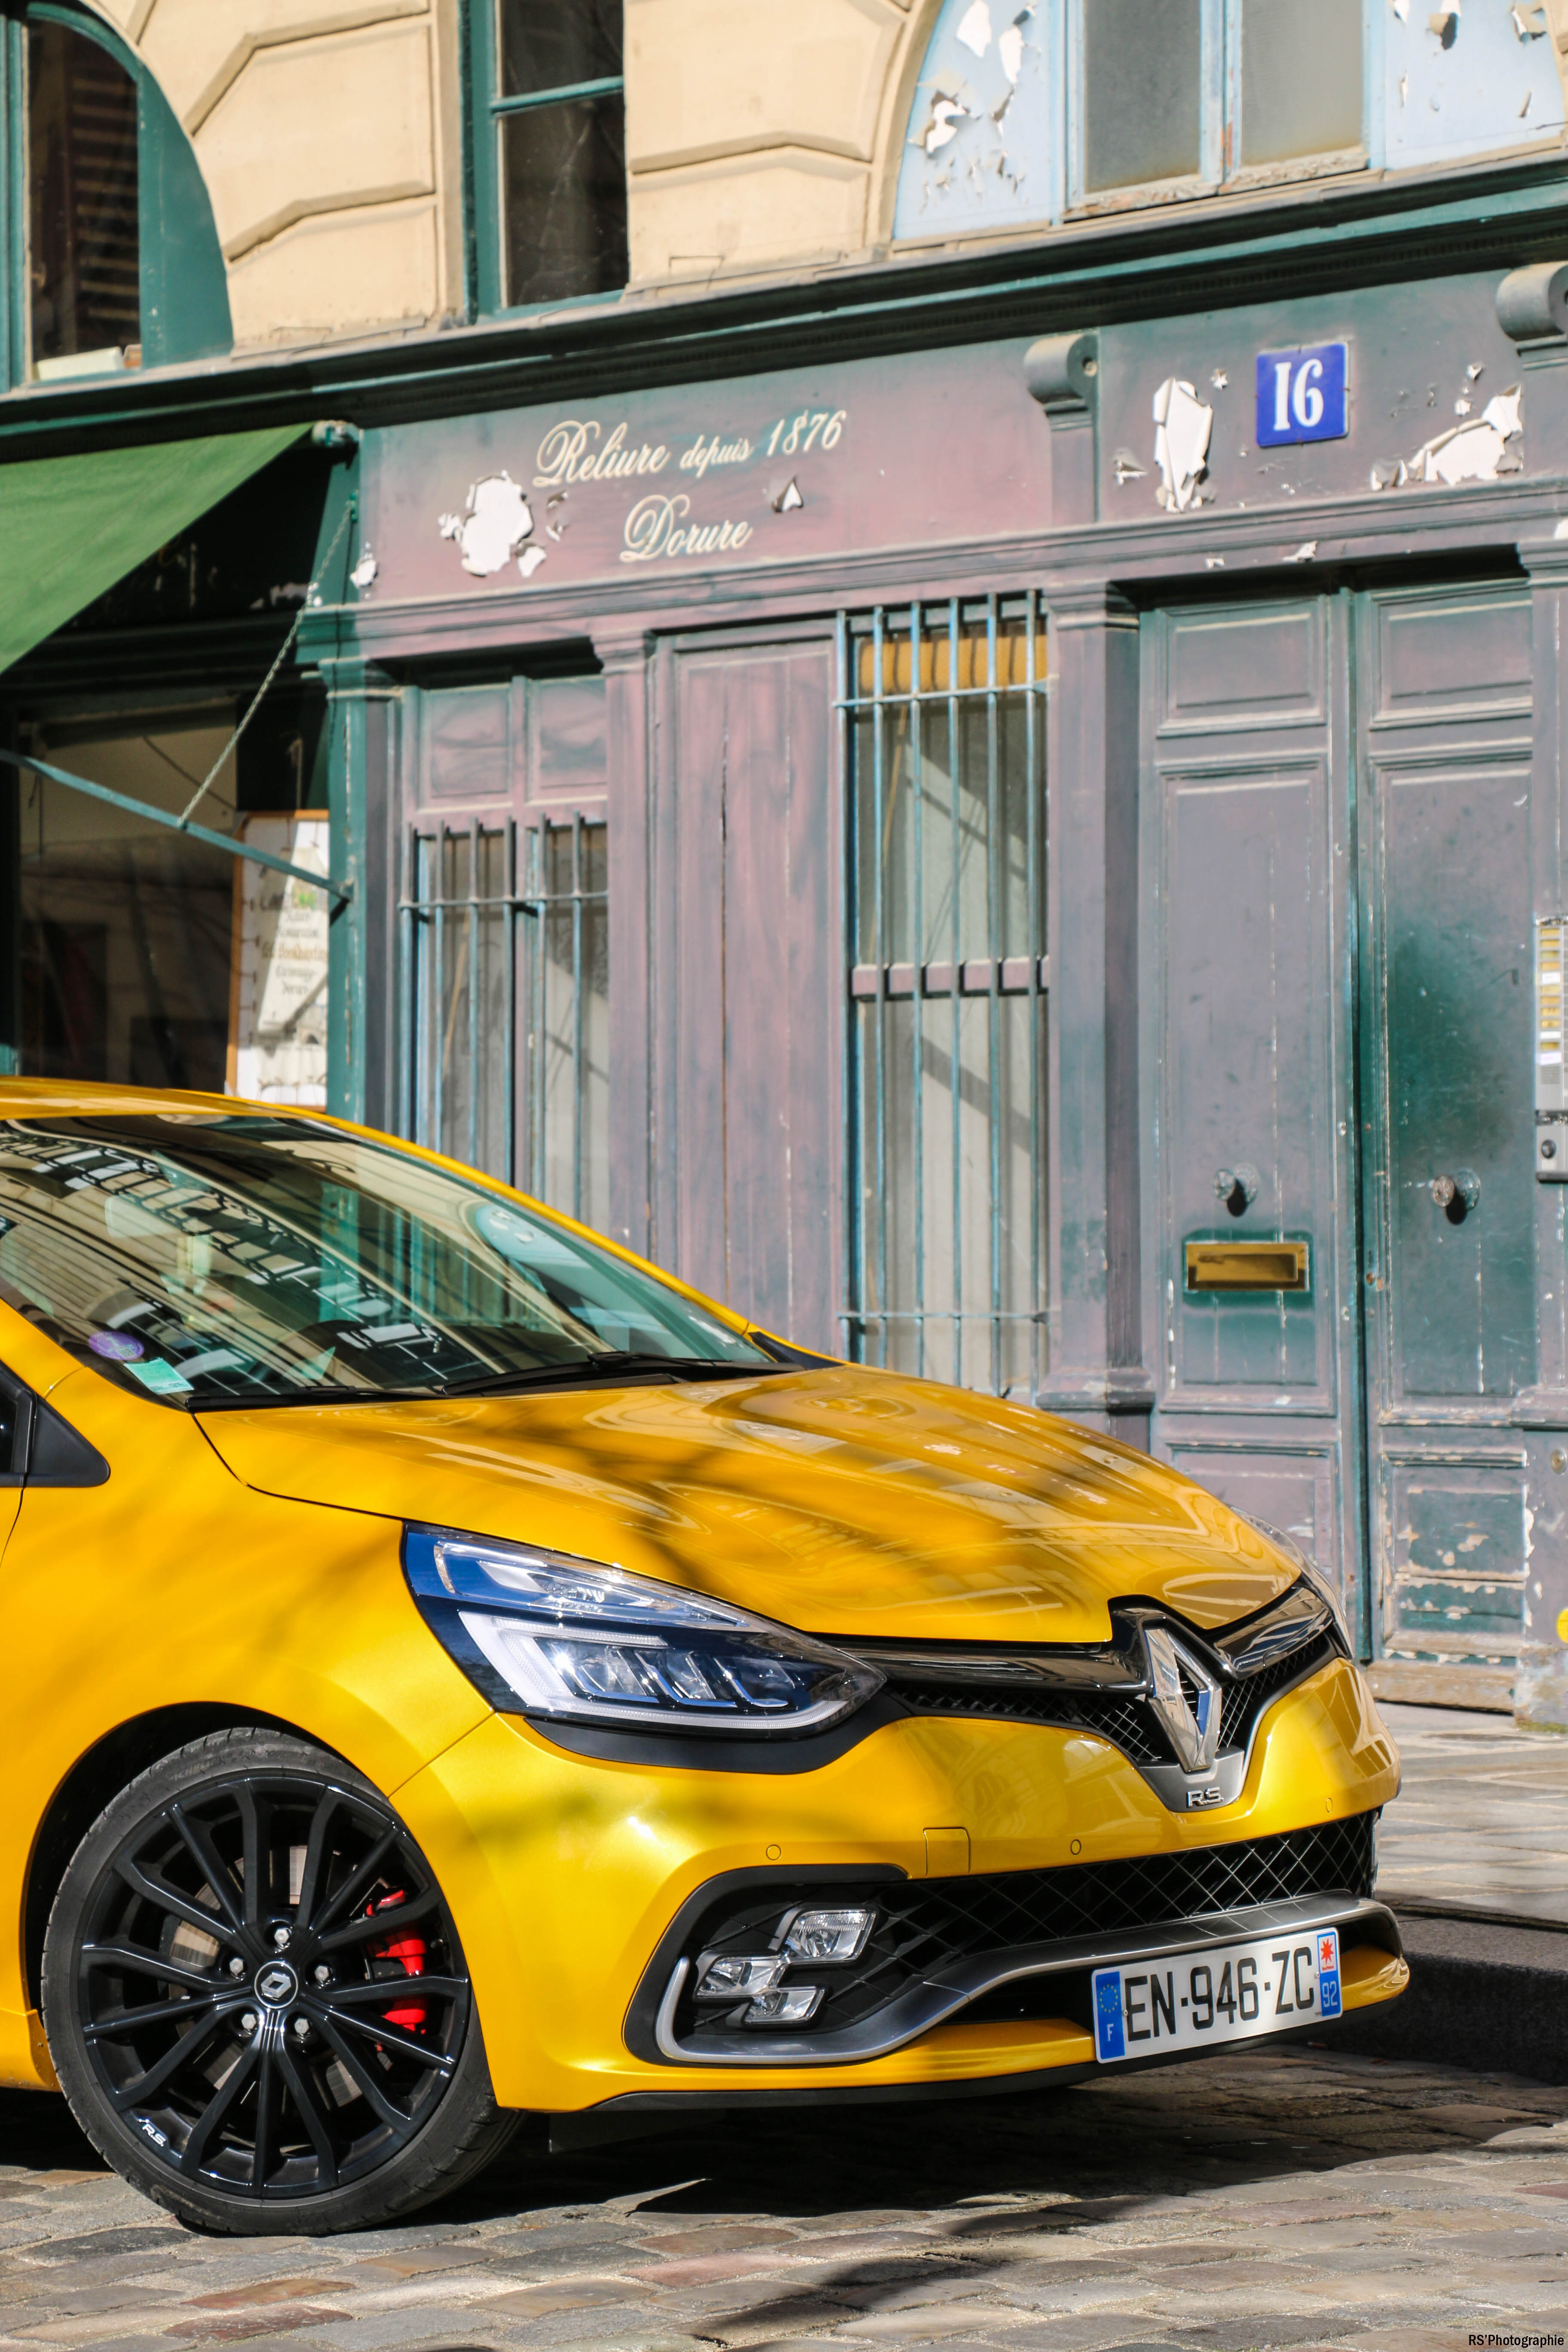 RenaultclioIVRSTrophy46-renault-clio-RS-trophy-avant-front-Arnaud Demasier-RSPhotographie